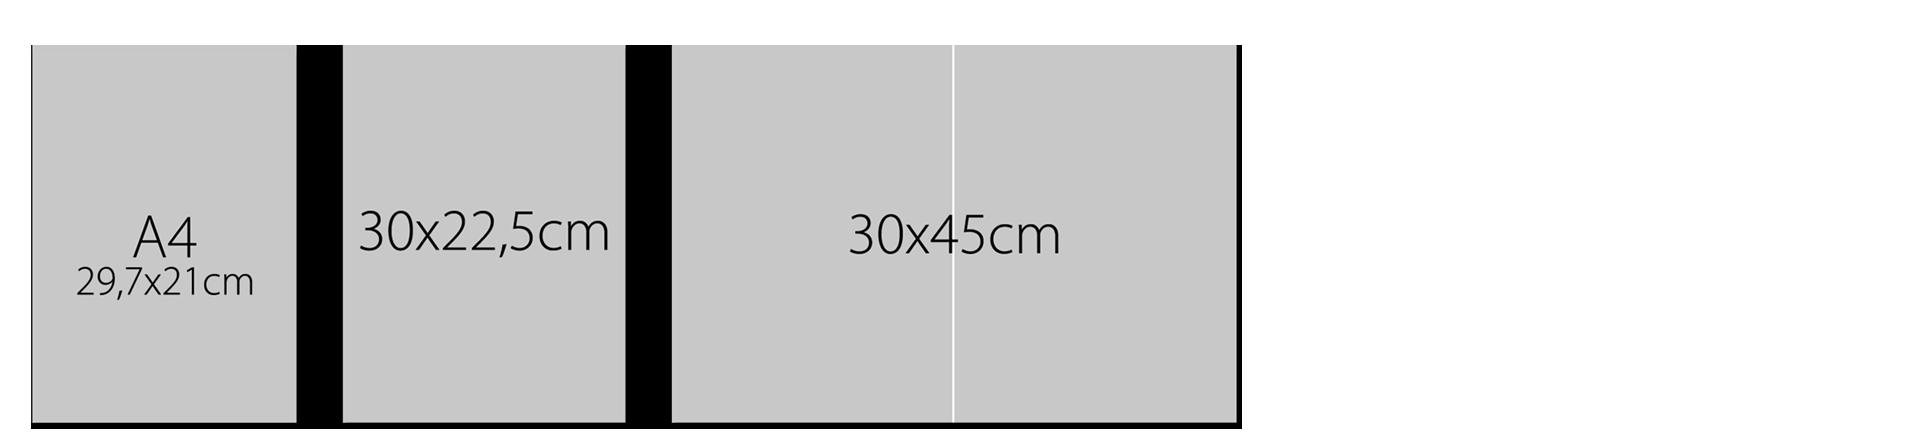 30x45